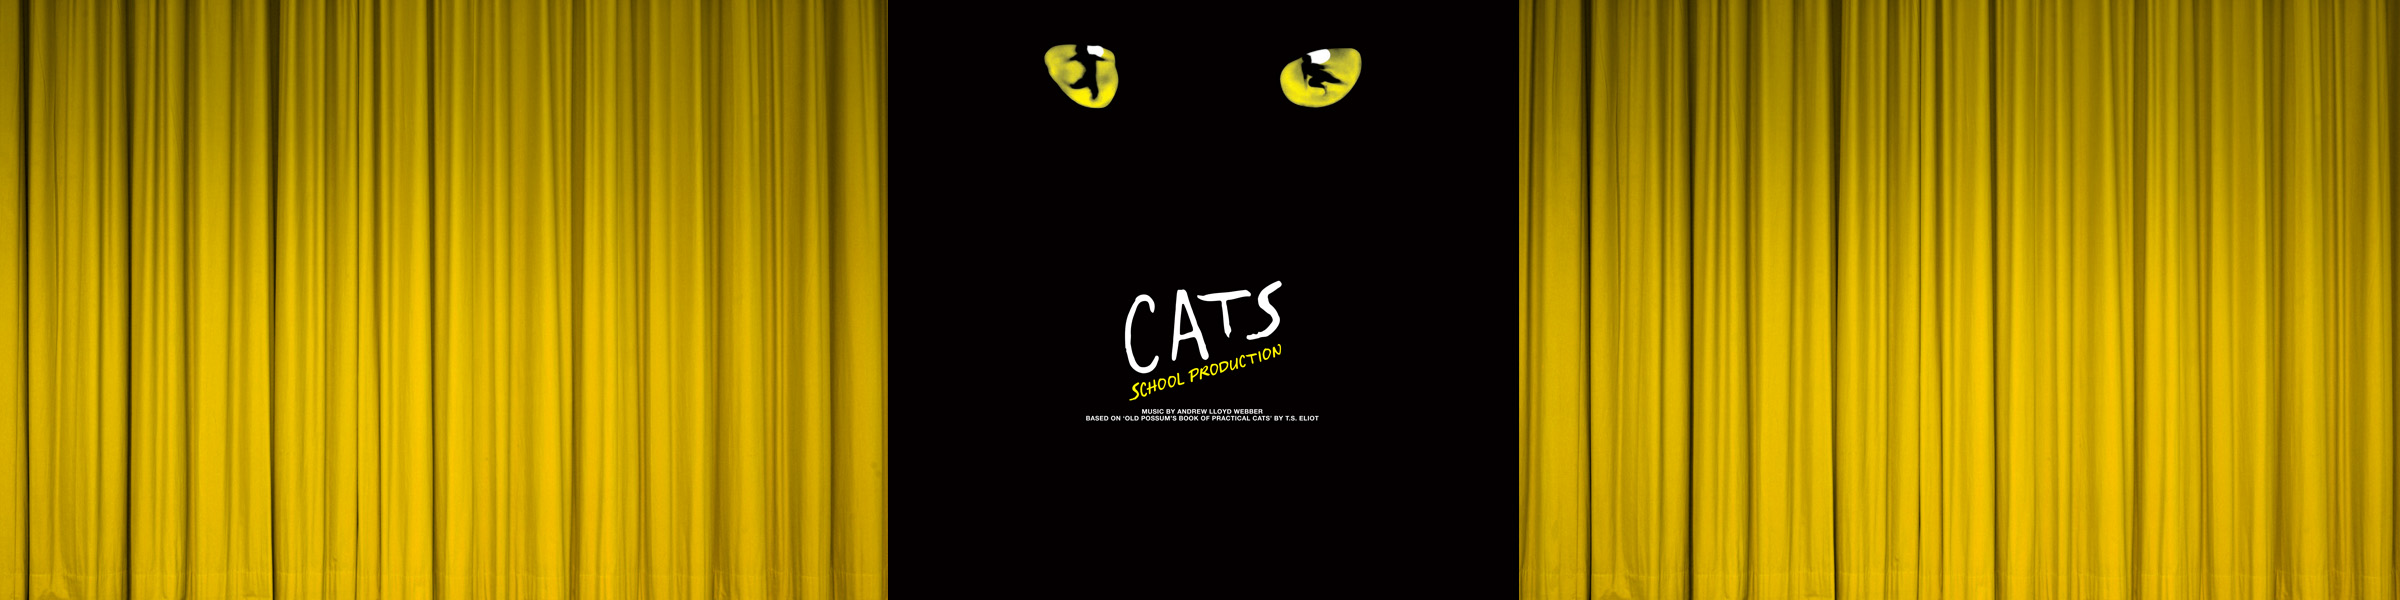 CGGS_Homepage_2400x600_Cats